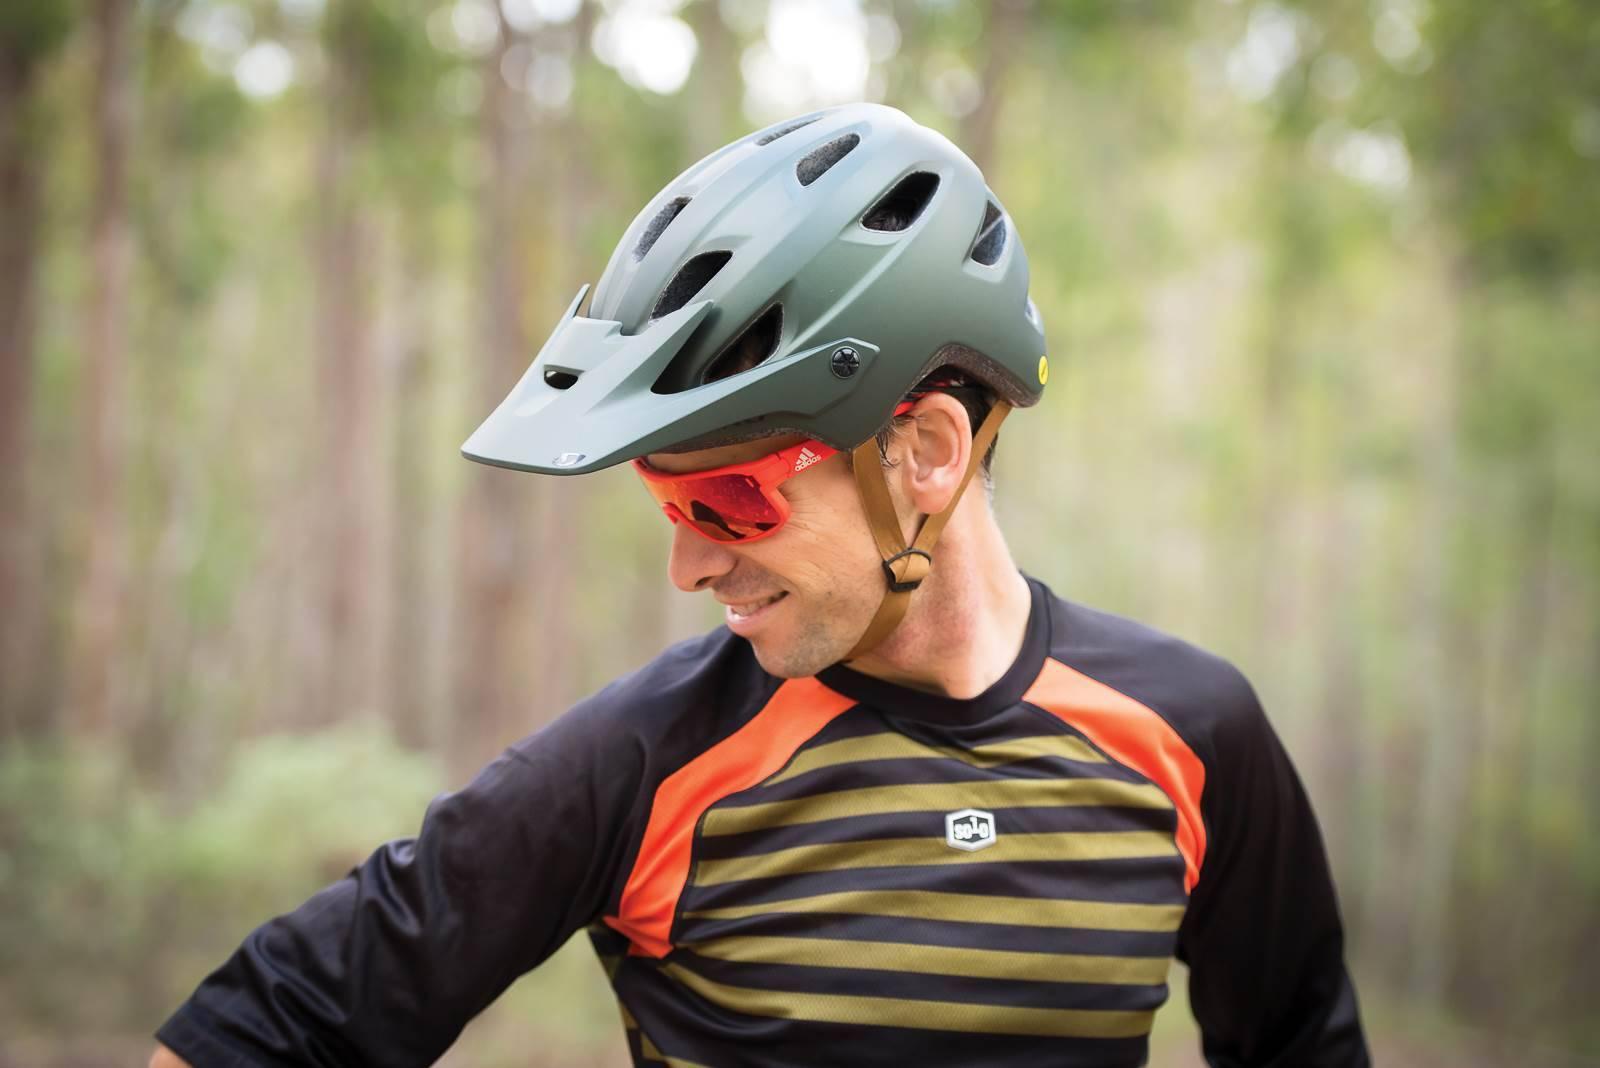 Giro Bike Helmets >> TESTED: Giro chronicle MIPS helmet - Australian Mountain Bike | The home for Australian Mountain ...